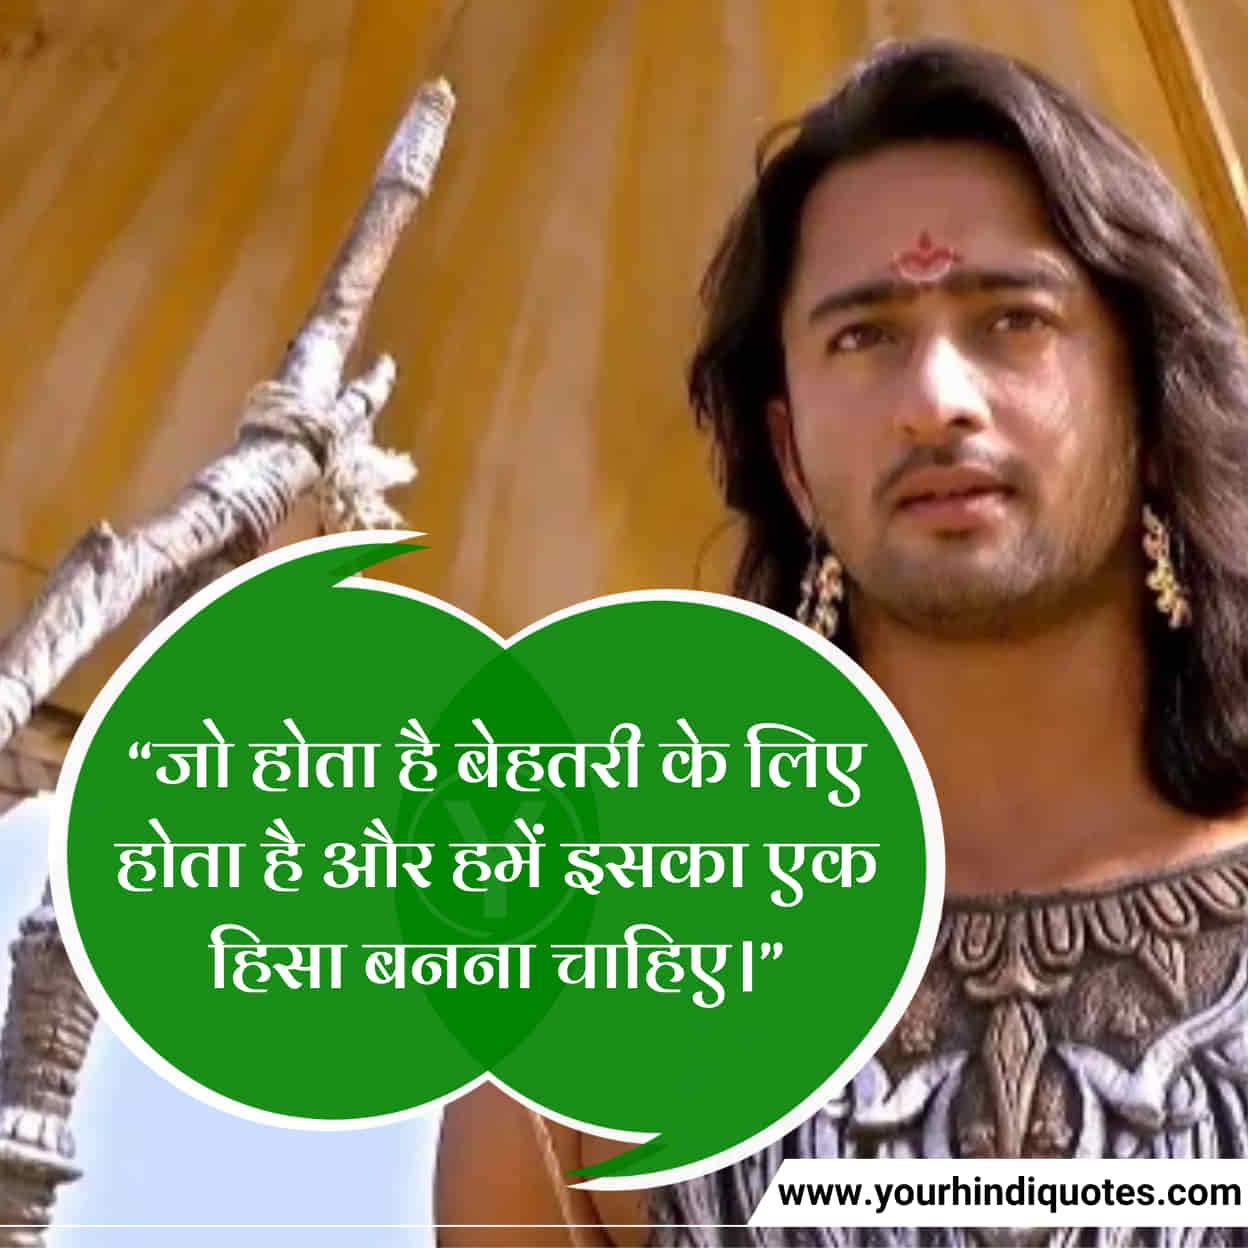 Hindi Bhagwat Gita Motivational Quotes